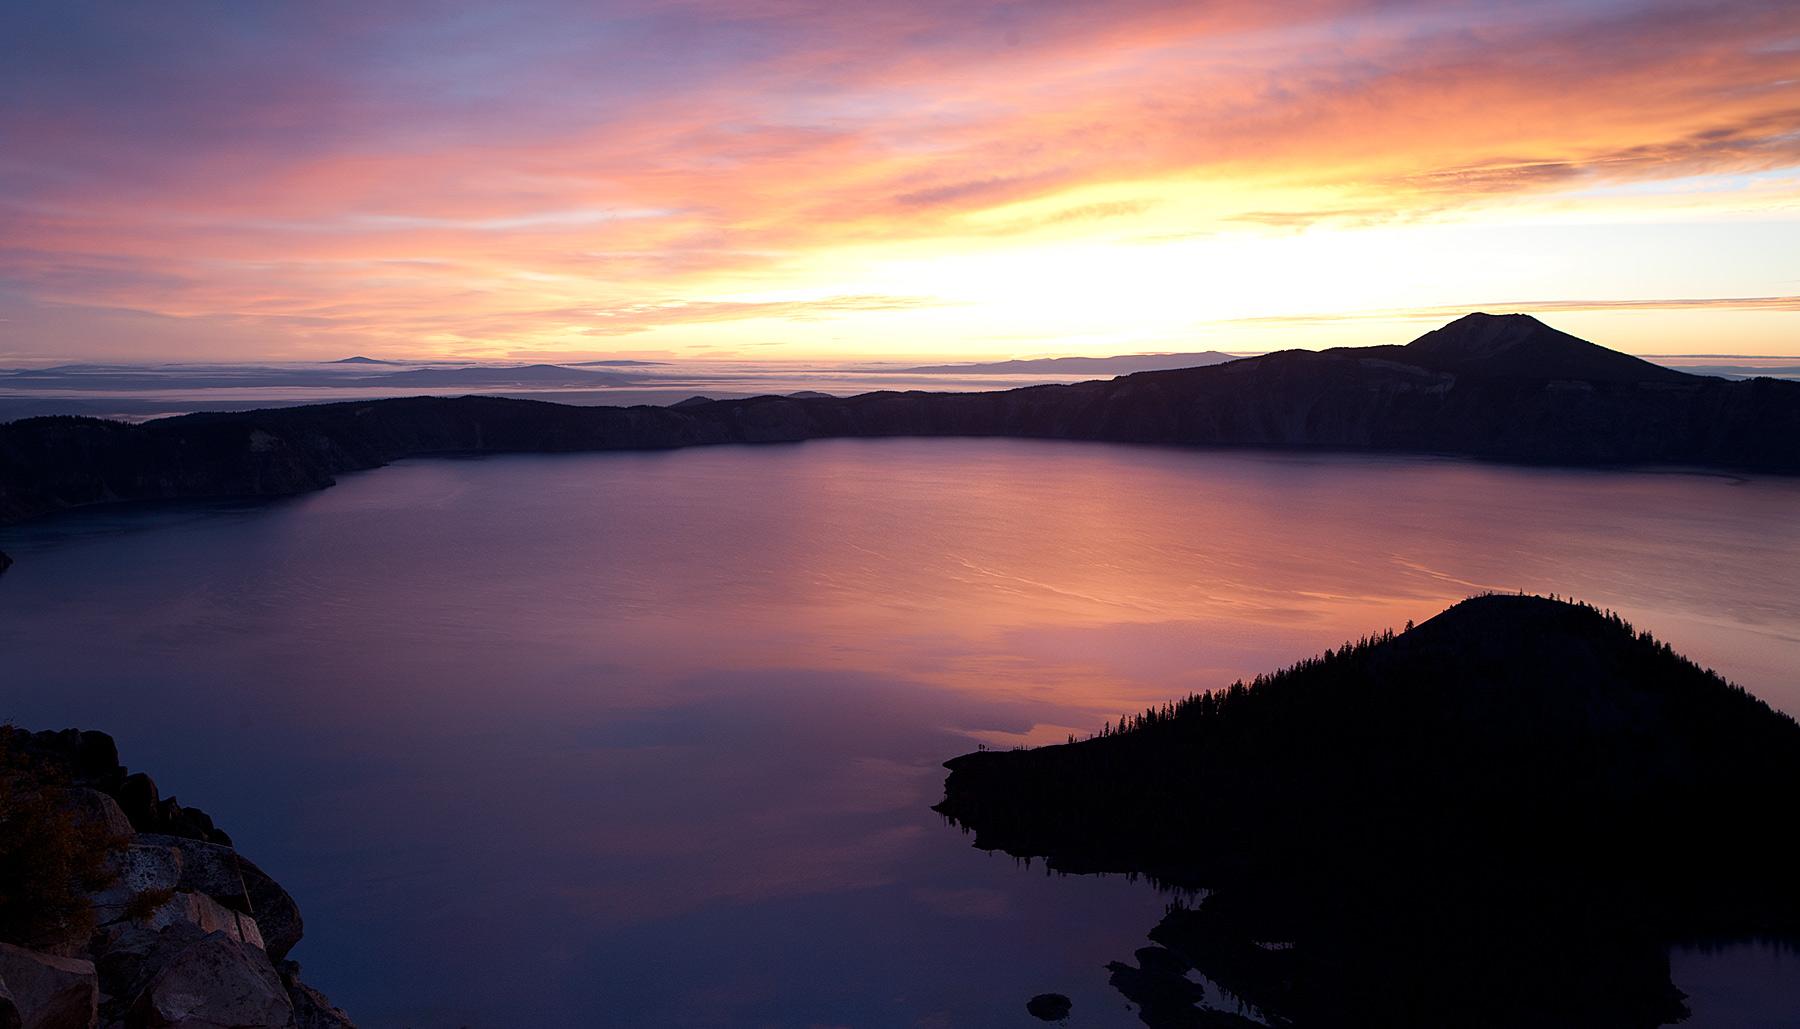 Crater-Lake-sunrise.jpg